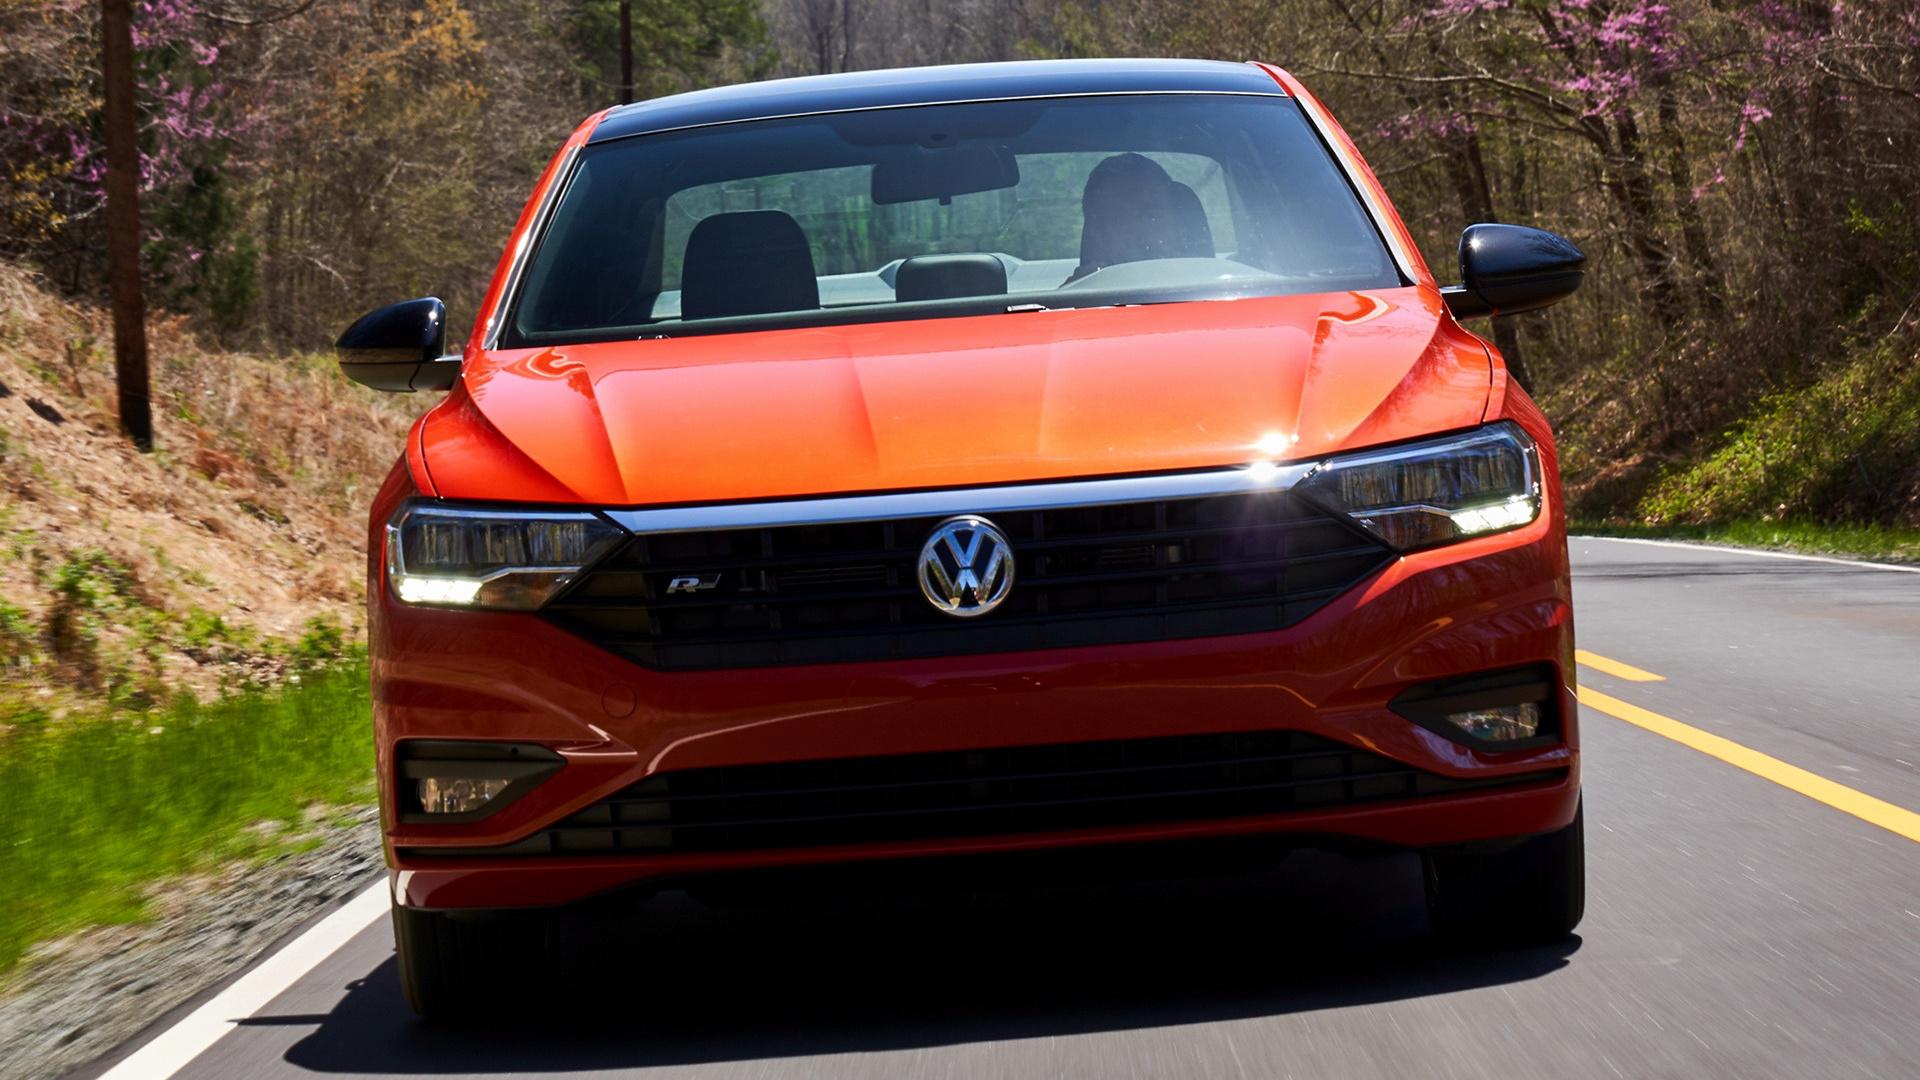 2019 Droped Jetta Wallpapers: 2019 Volkswagen Jetta R-Line